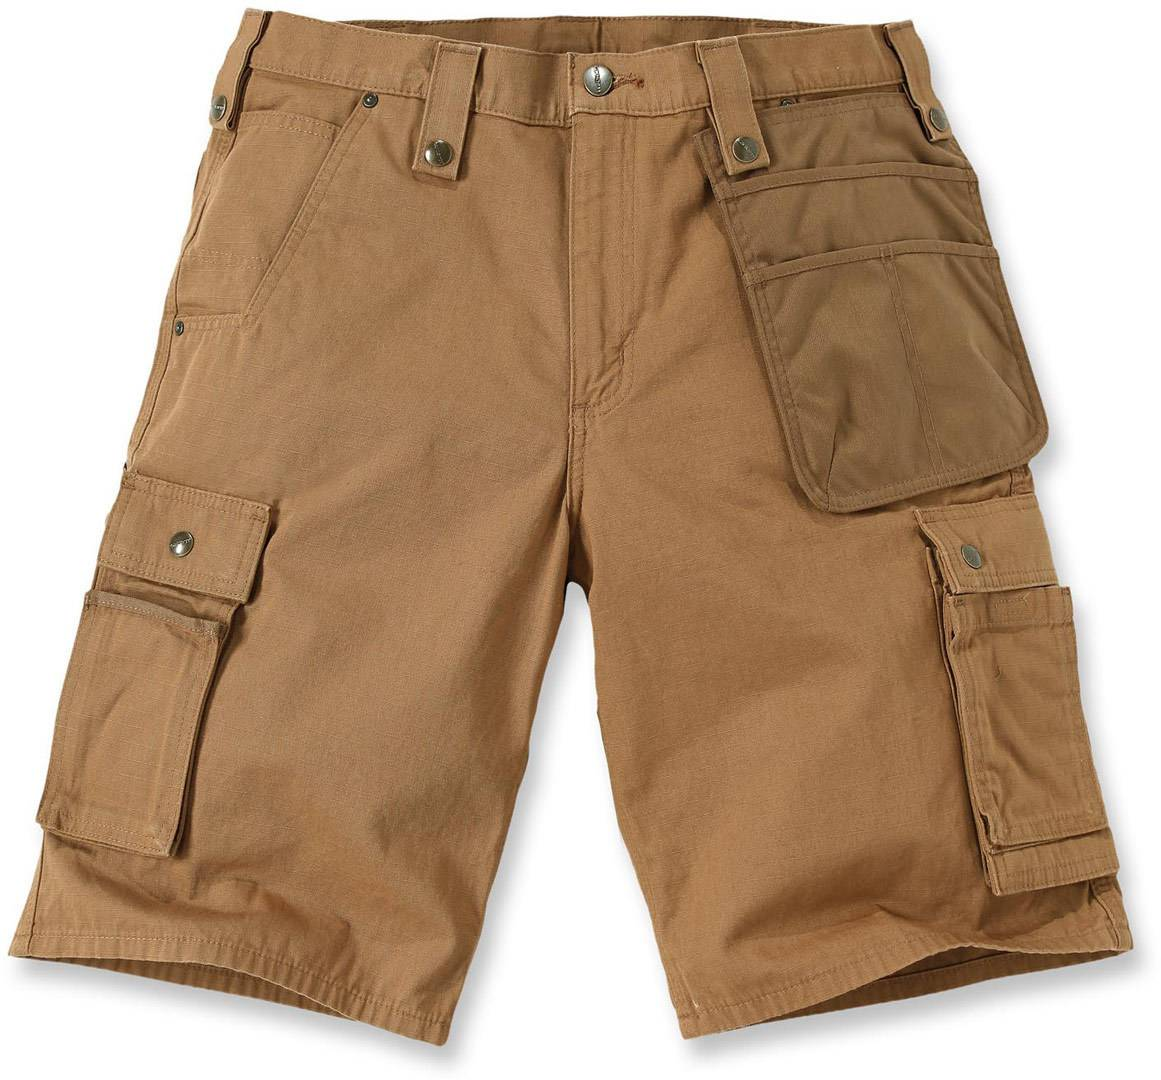 Carhartt Multi Pocket Ripstop Pantalones cortos Marrón 36